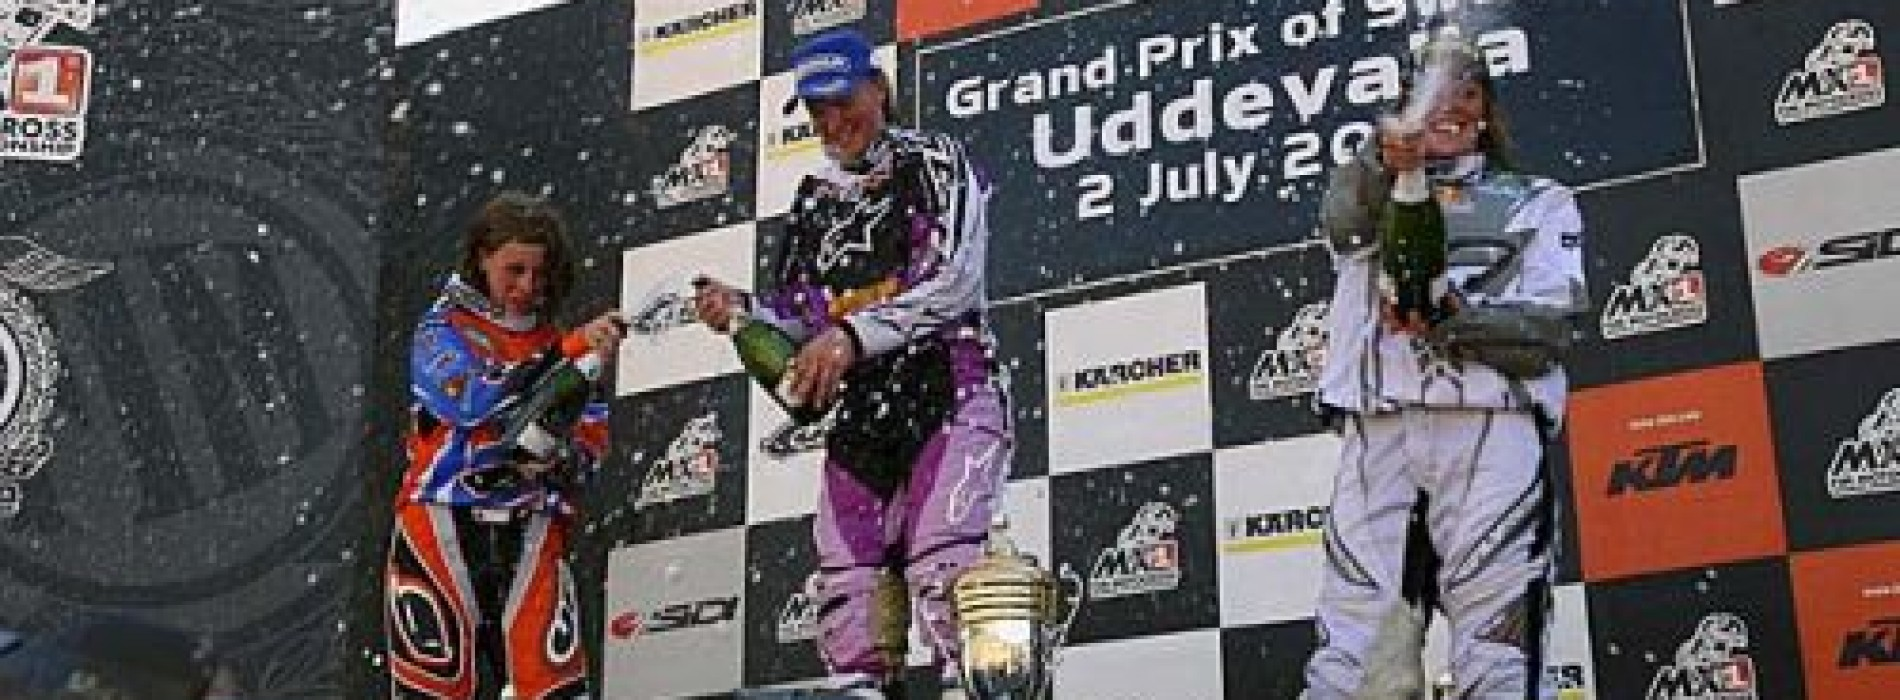 Women's World Motocross Champion 2006 and 2007: Katherine Prumm (now Oberlin-Brown)